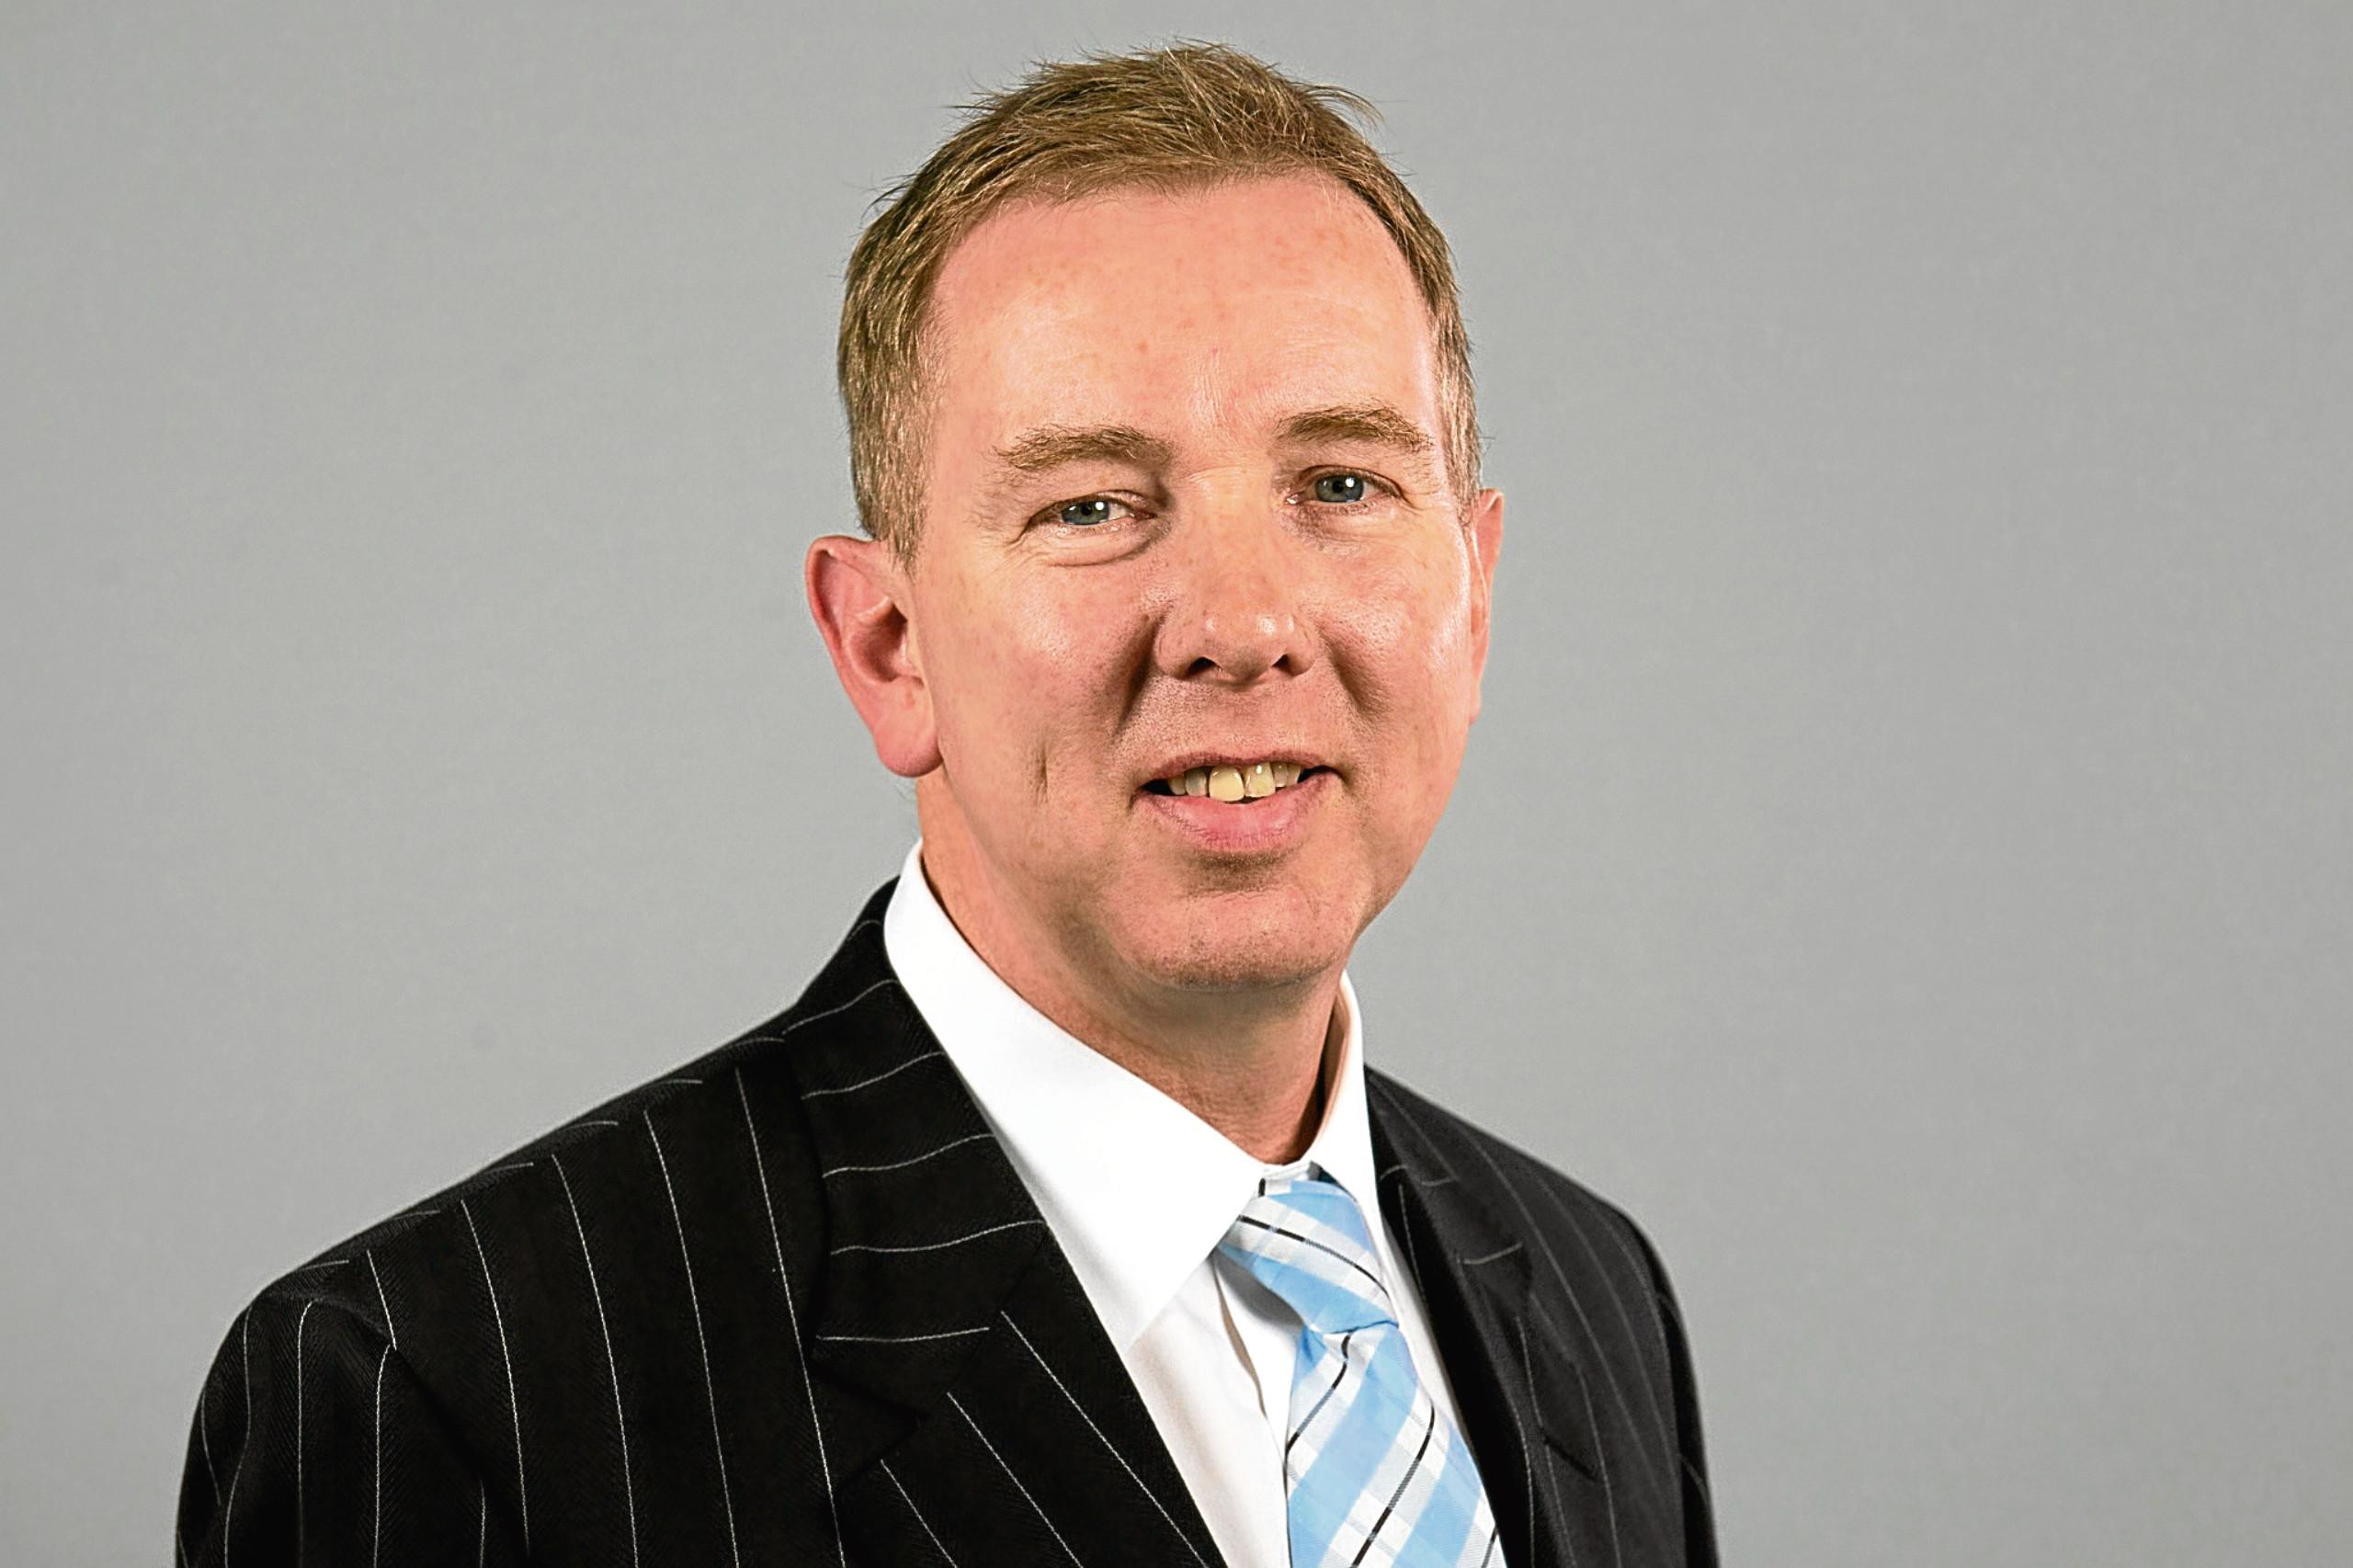 Scotmid chief executive John Brodie